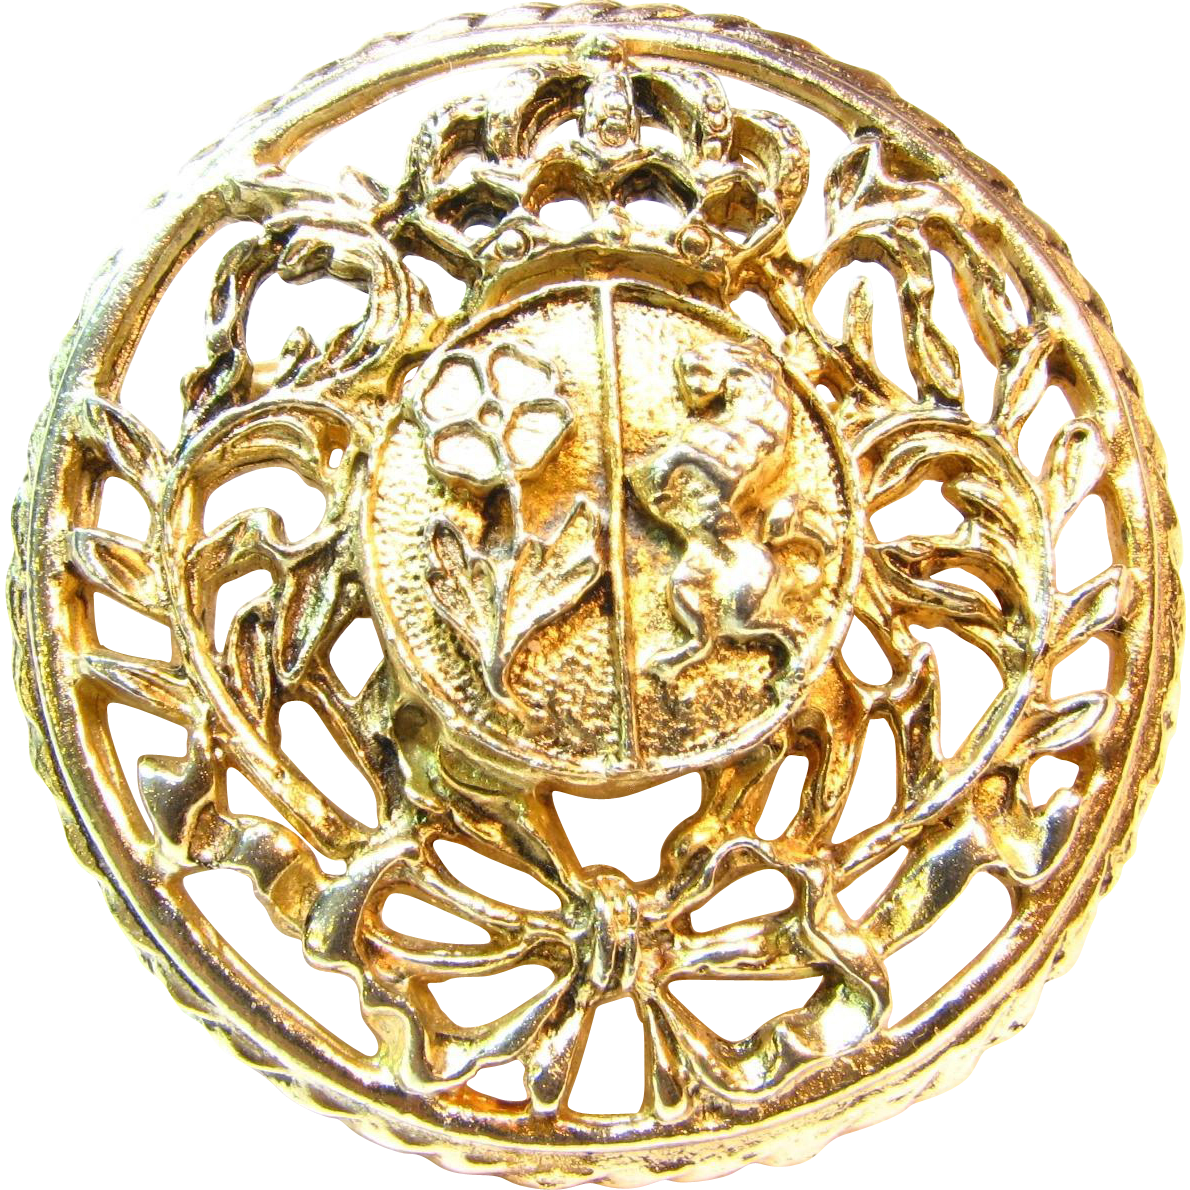 Pre -1955 Signed Heraldic Brooch by Coro